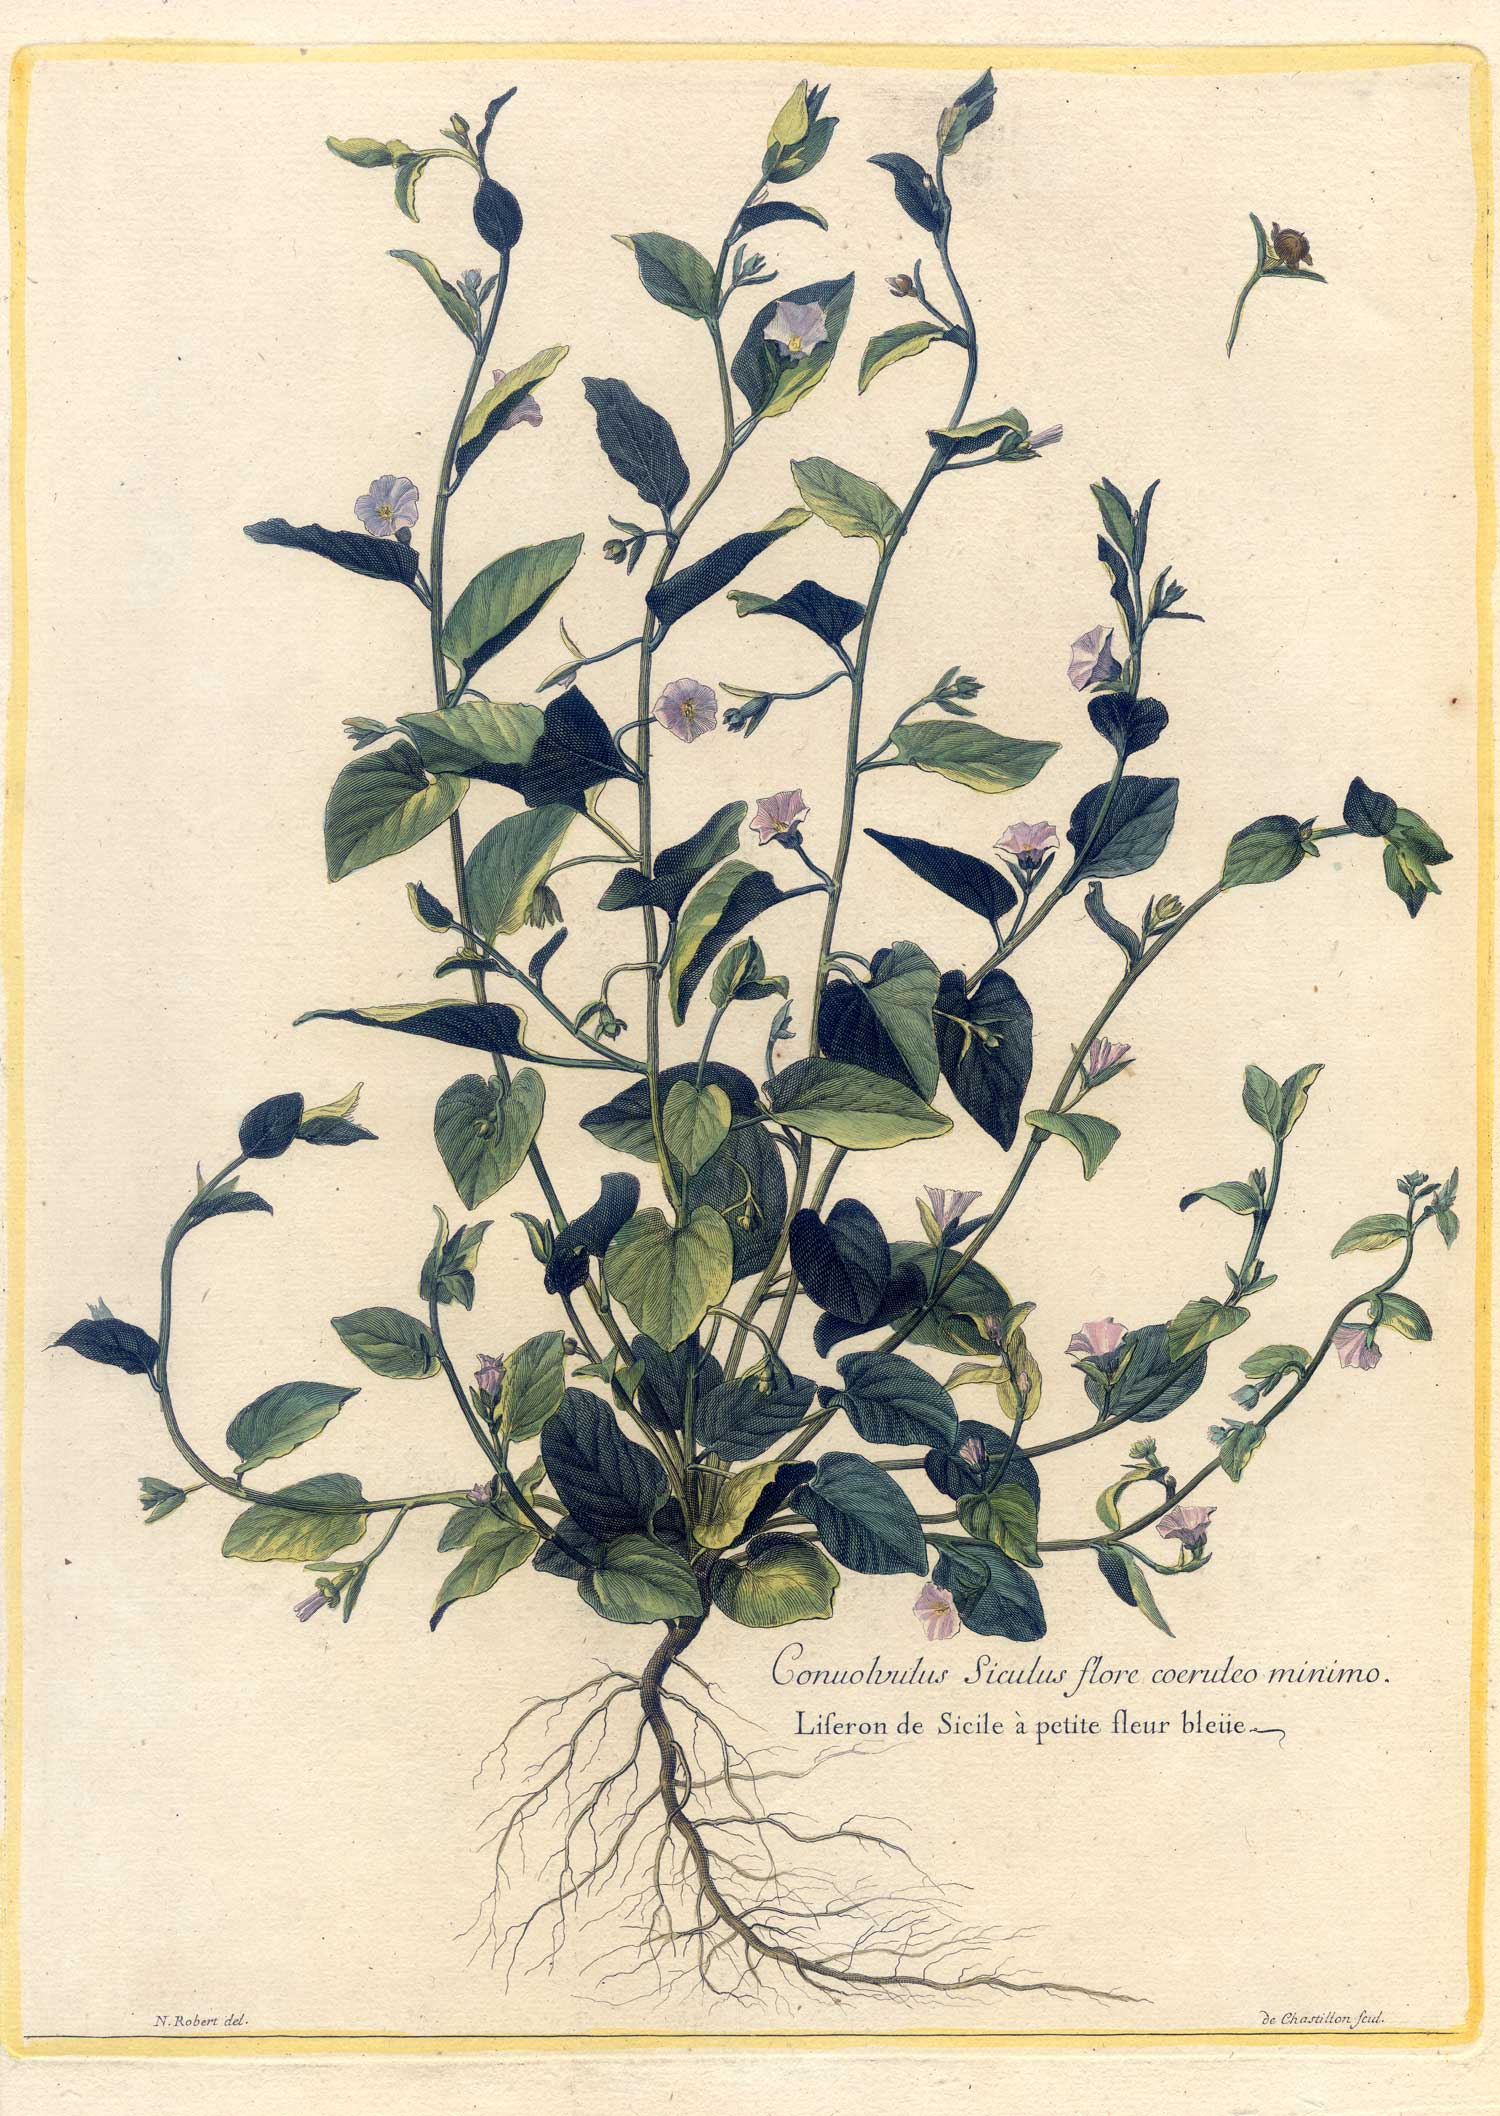 Conuolvolus - Blume-Botanik - Kupferstich Robert-Chastillon 1680 ...